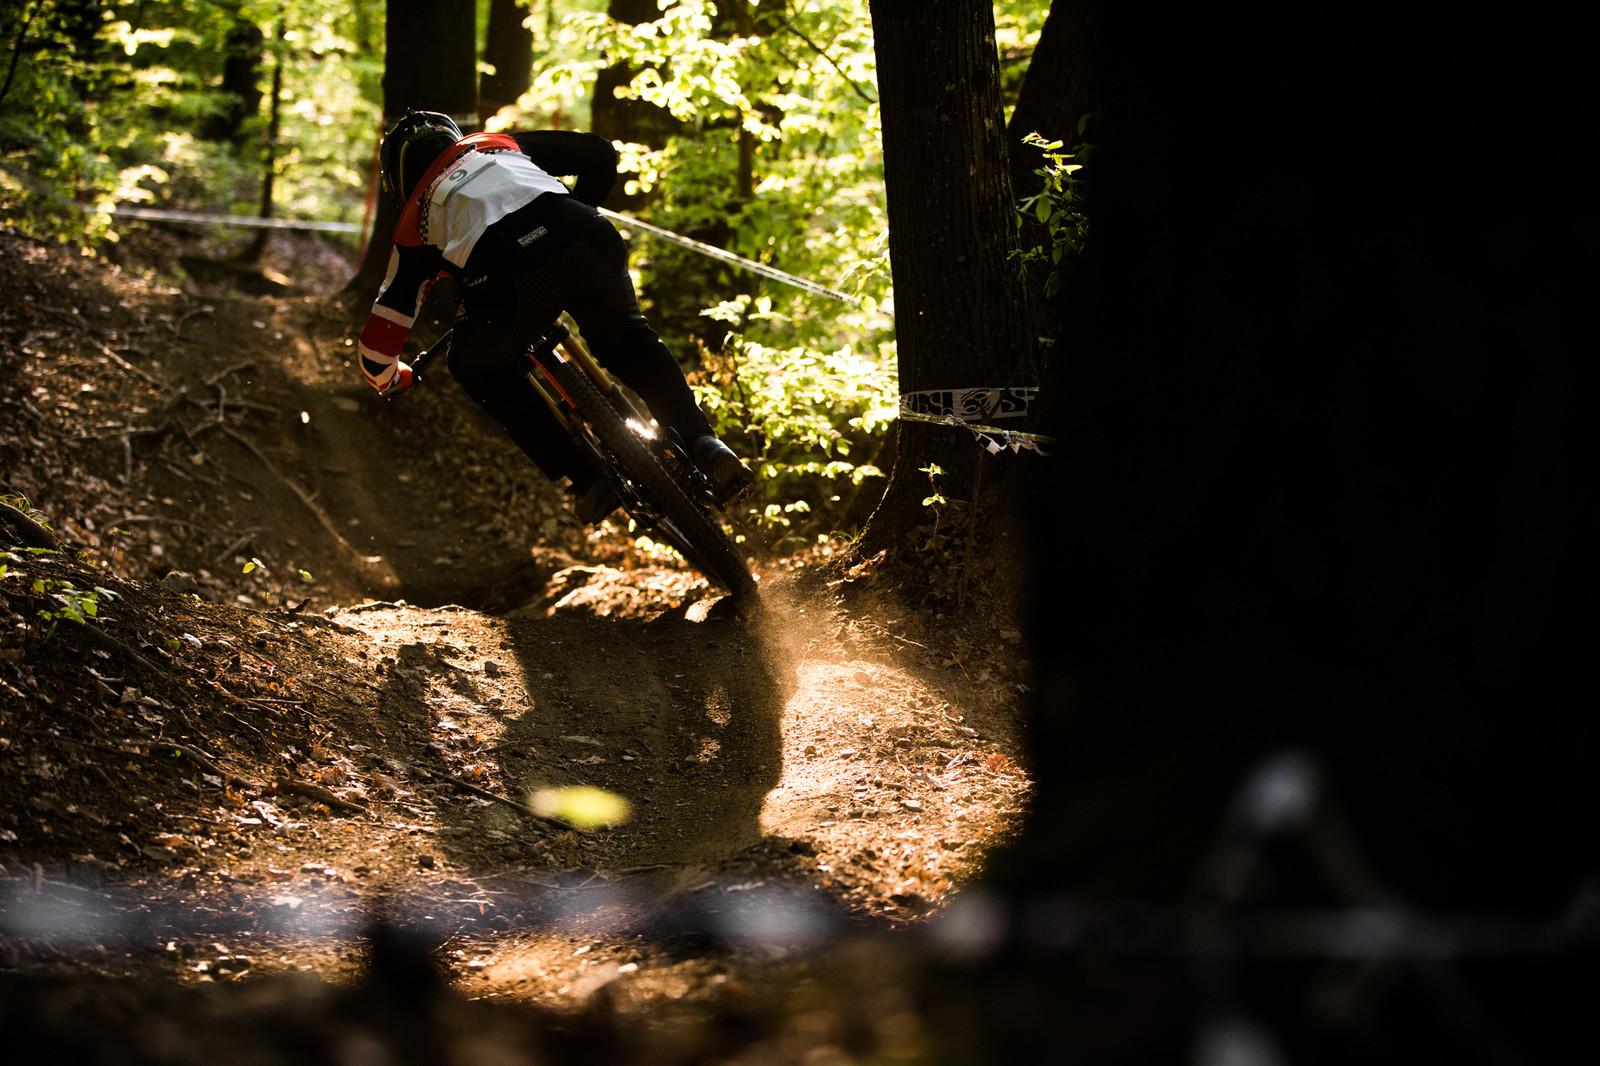 RACE REPORT - iXS DH Cup Maribor - iXS Downhill Cup Maribor - Race Gallery - Mountain Biking Pictures - Vital MTB